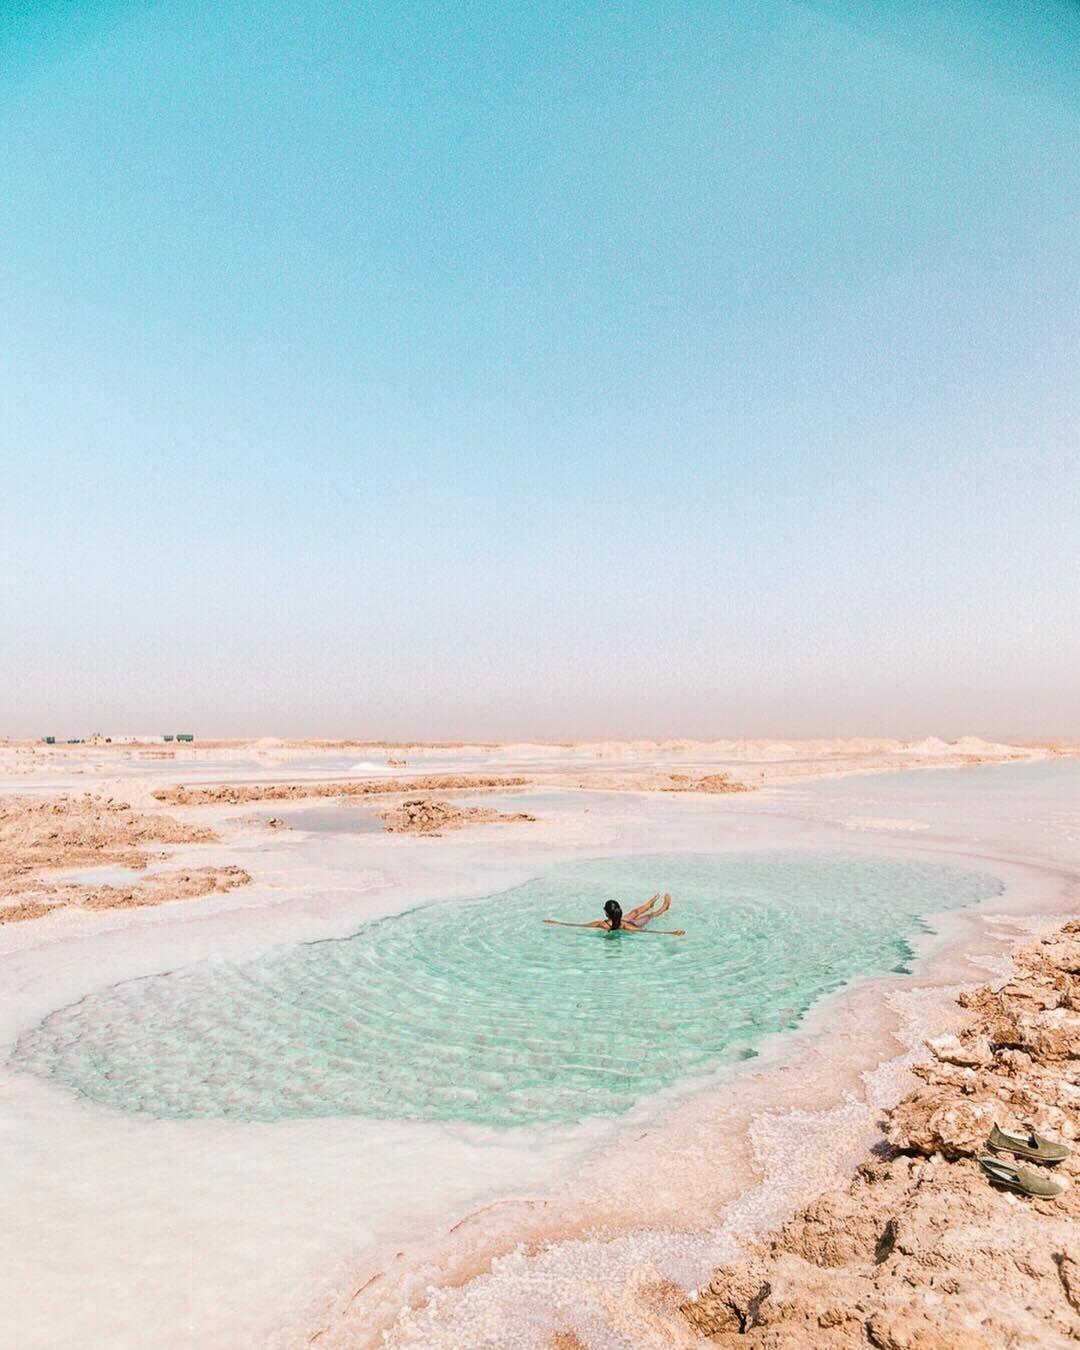 Salt lakkes-Siwa